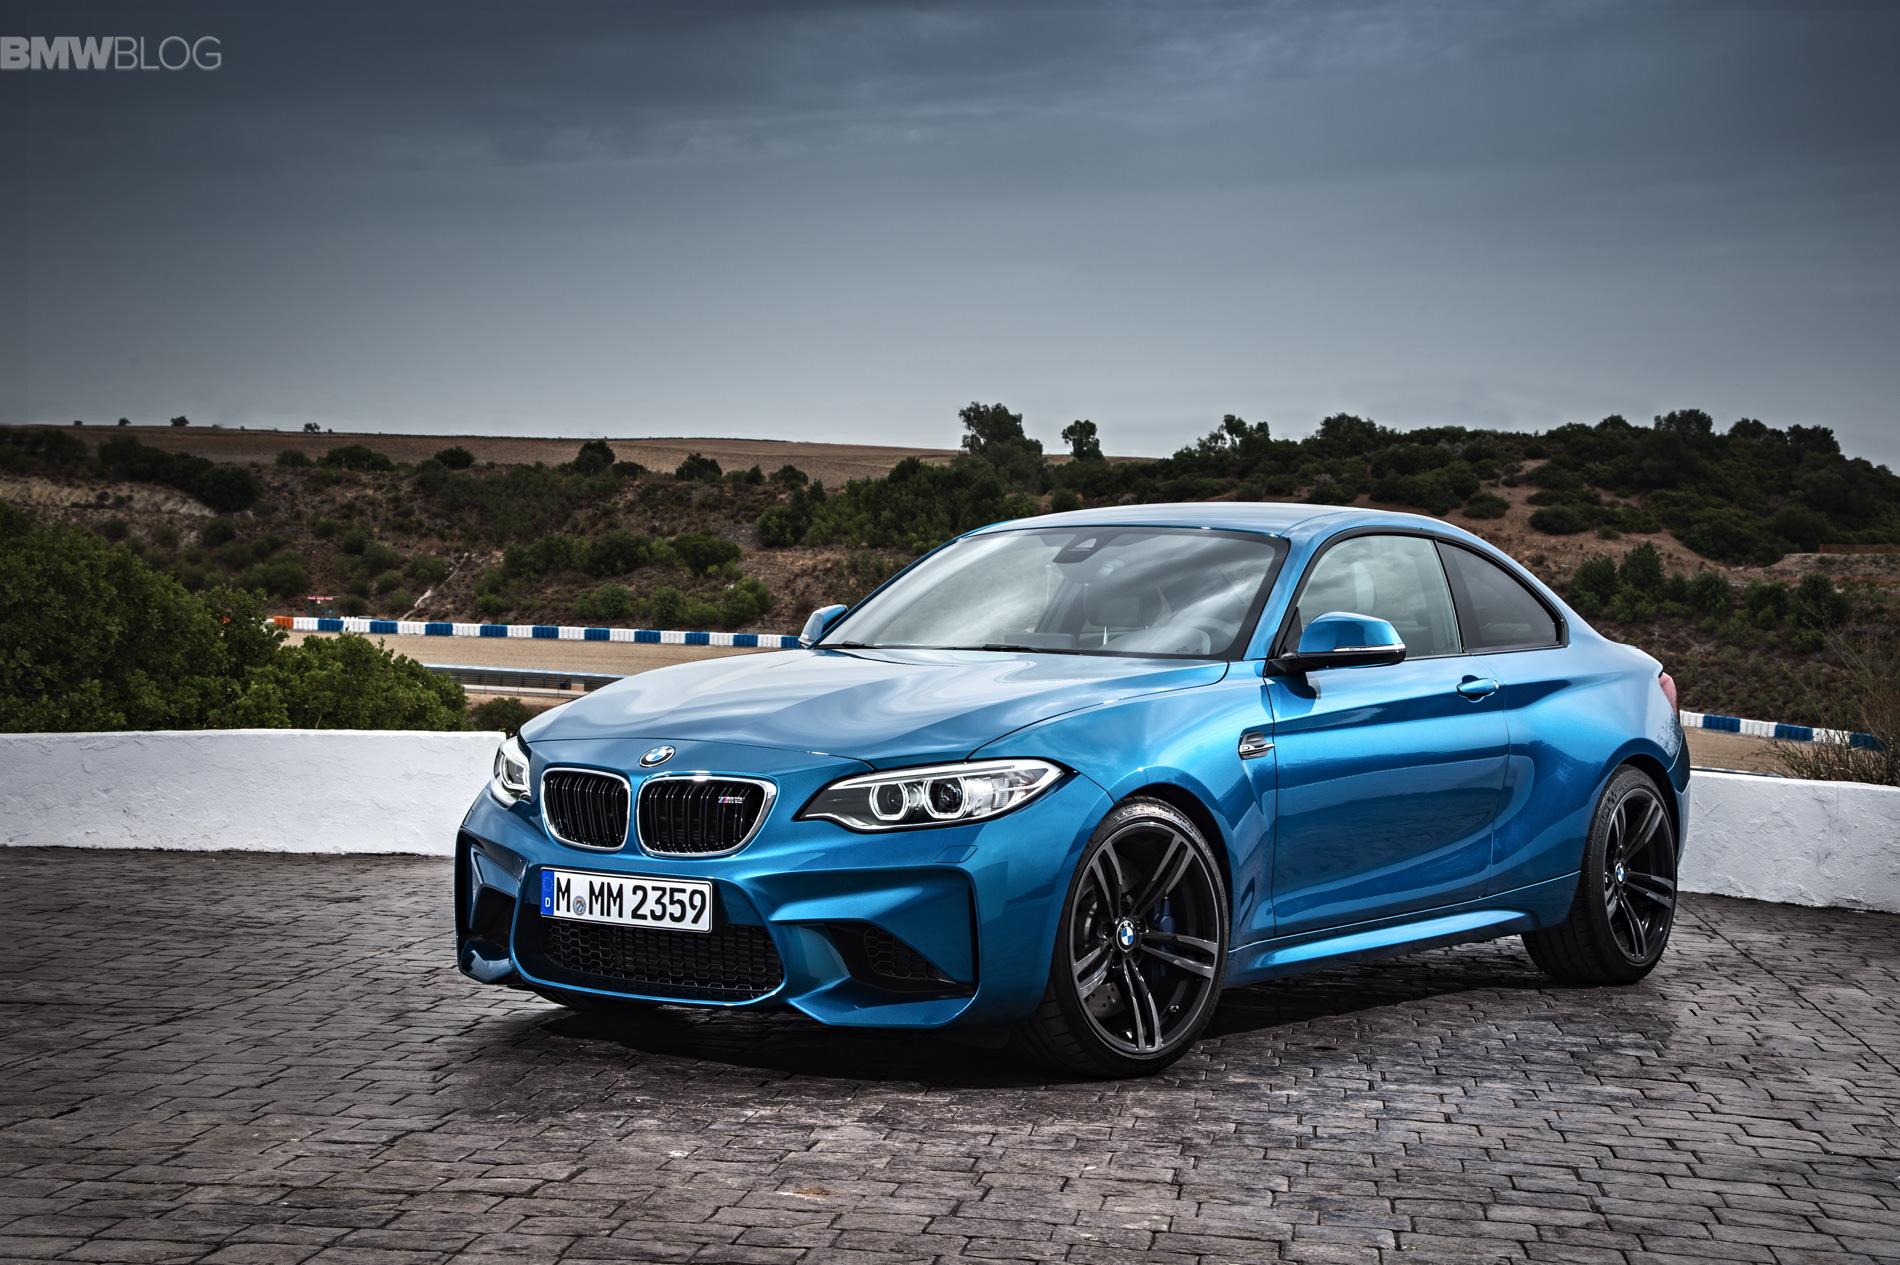 BMW M2 images 34